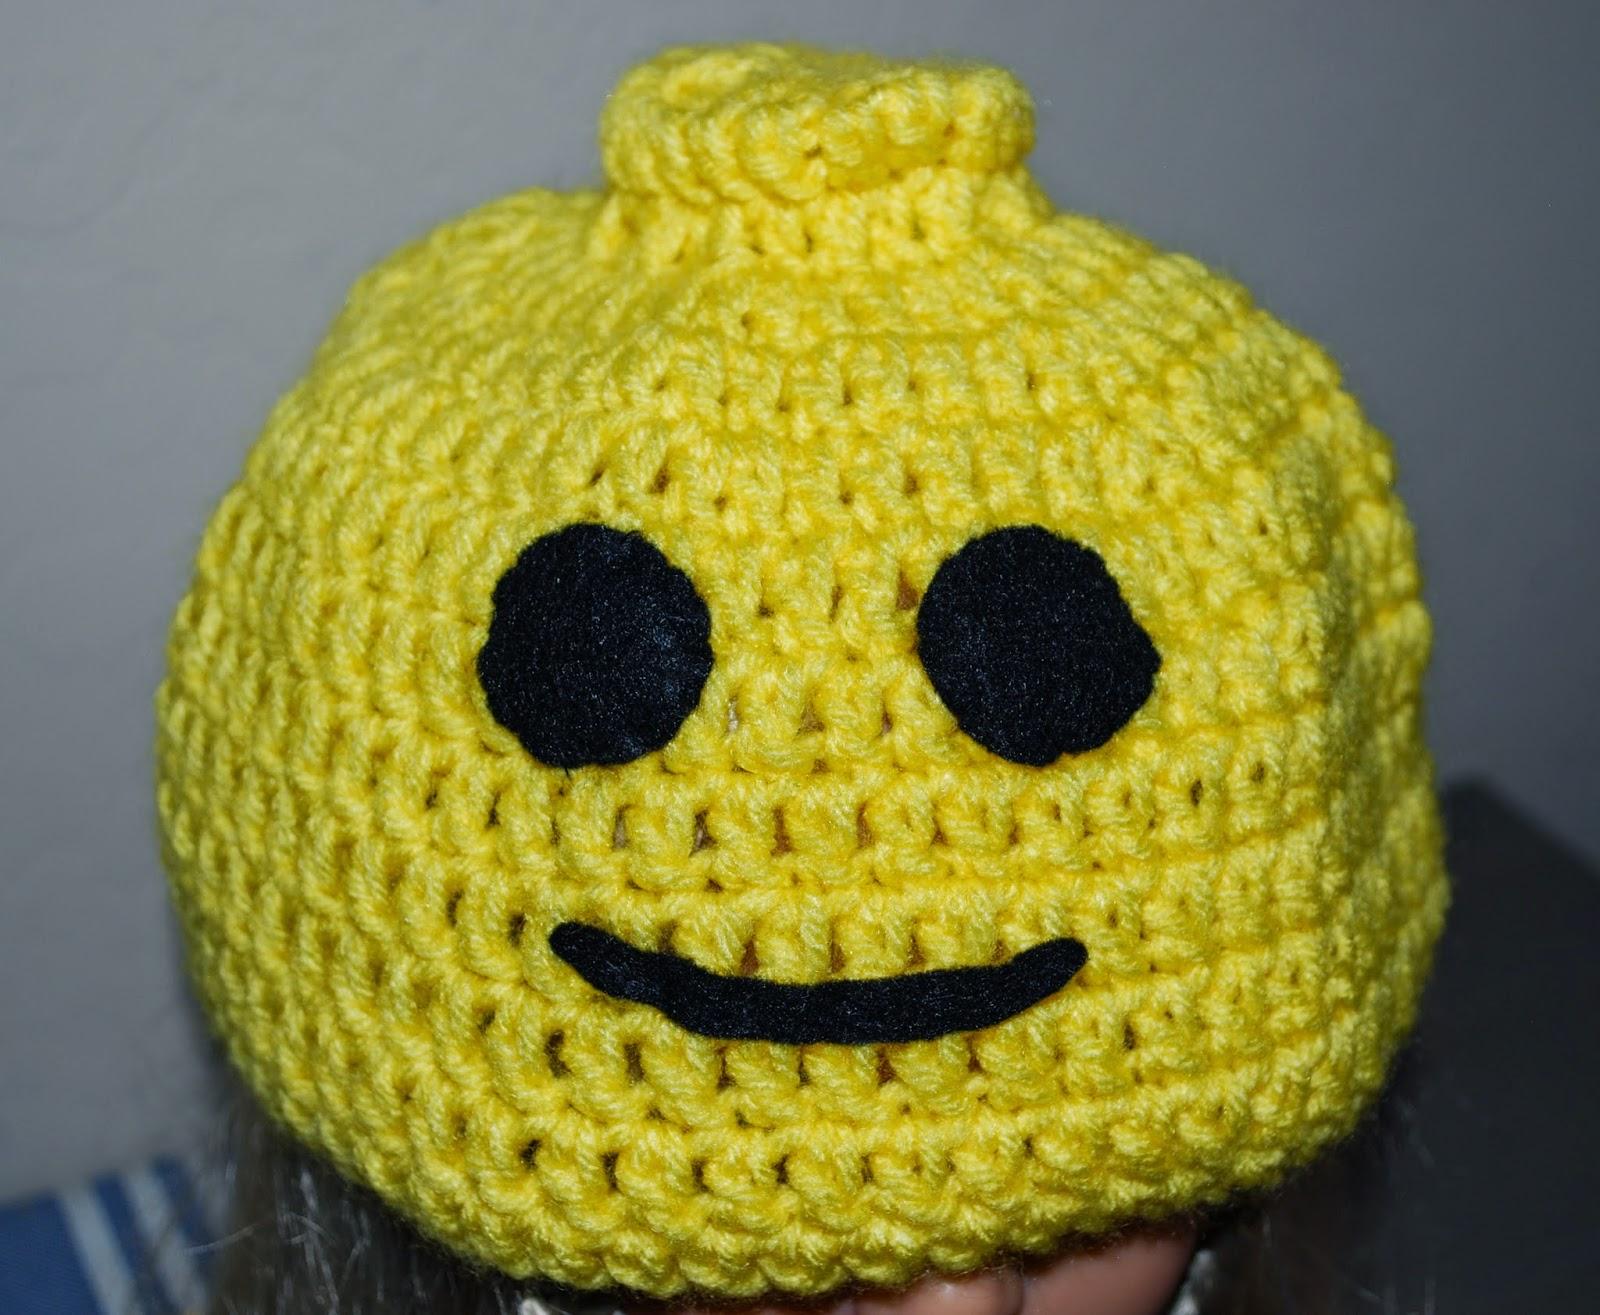 Crochet LEGO hat